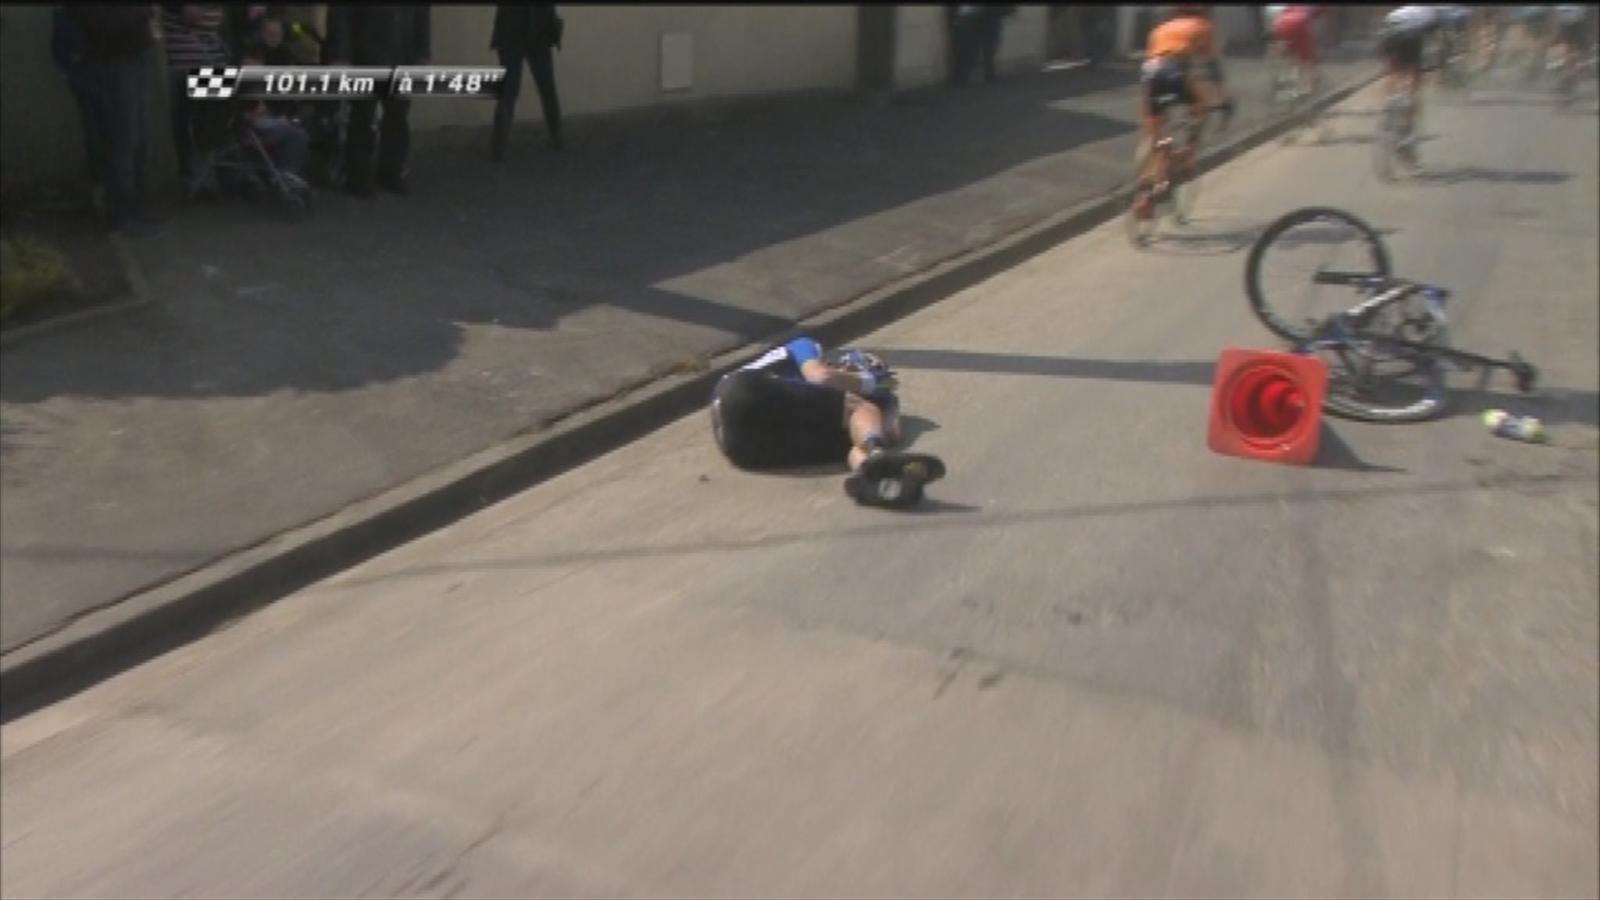 Paris - Roubaix : Zakari Dempster crashed - Eurosport